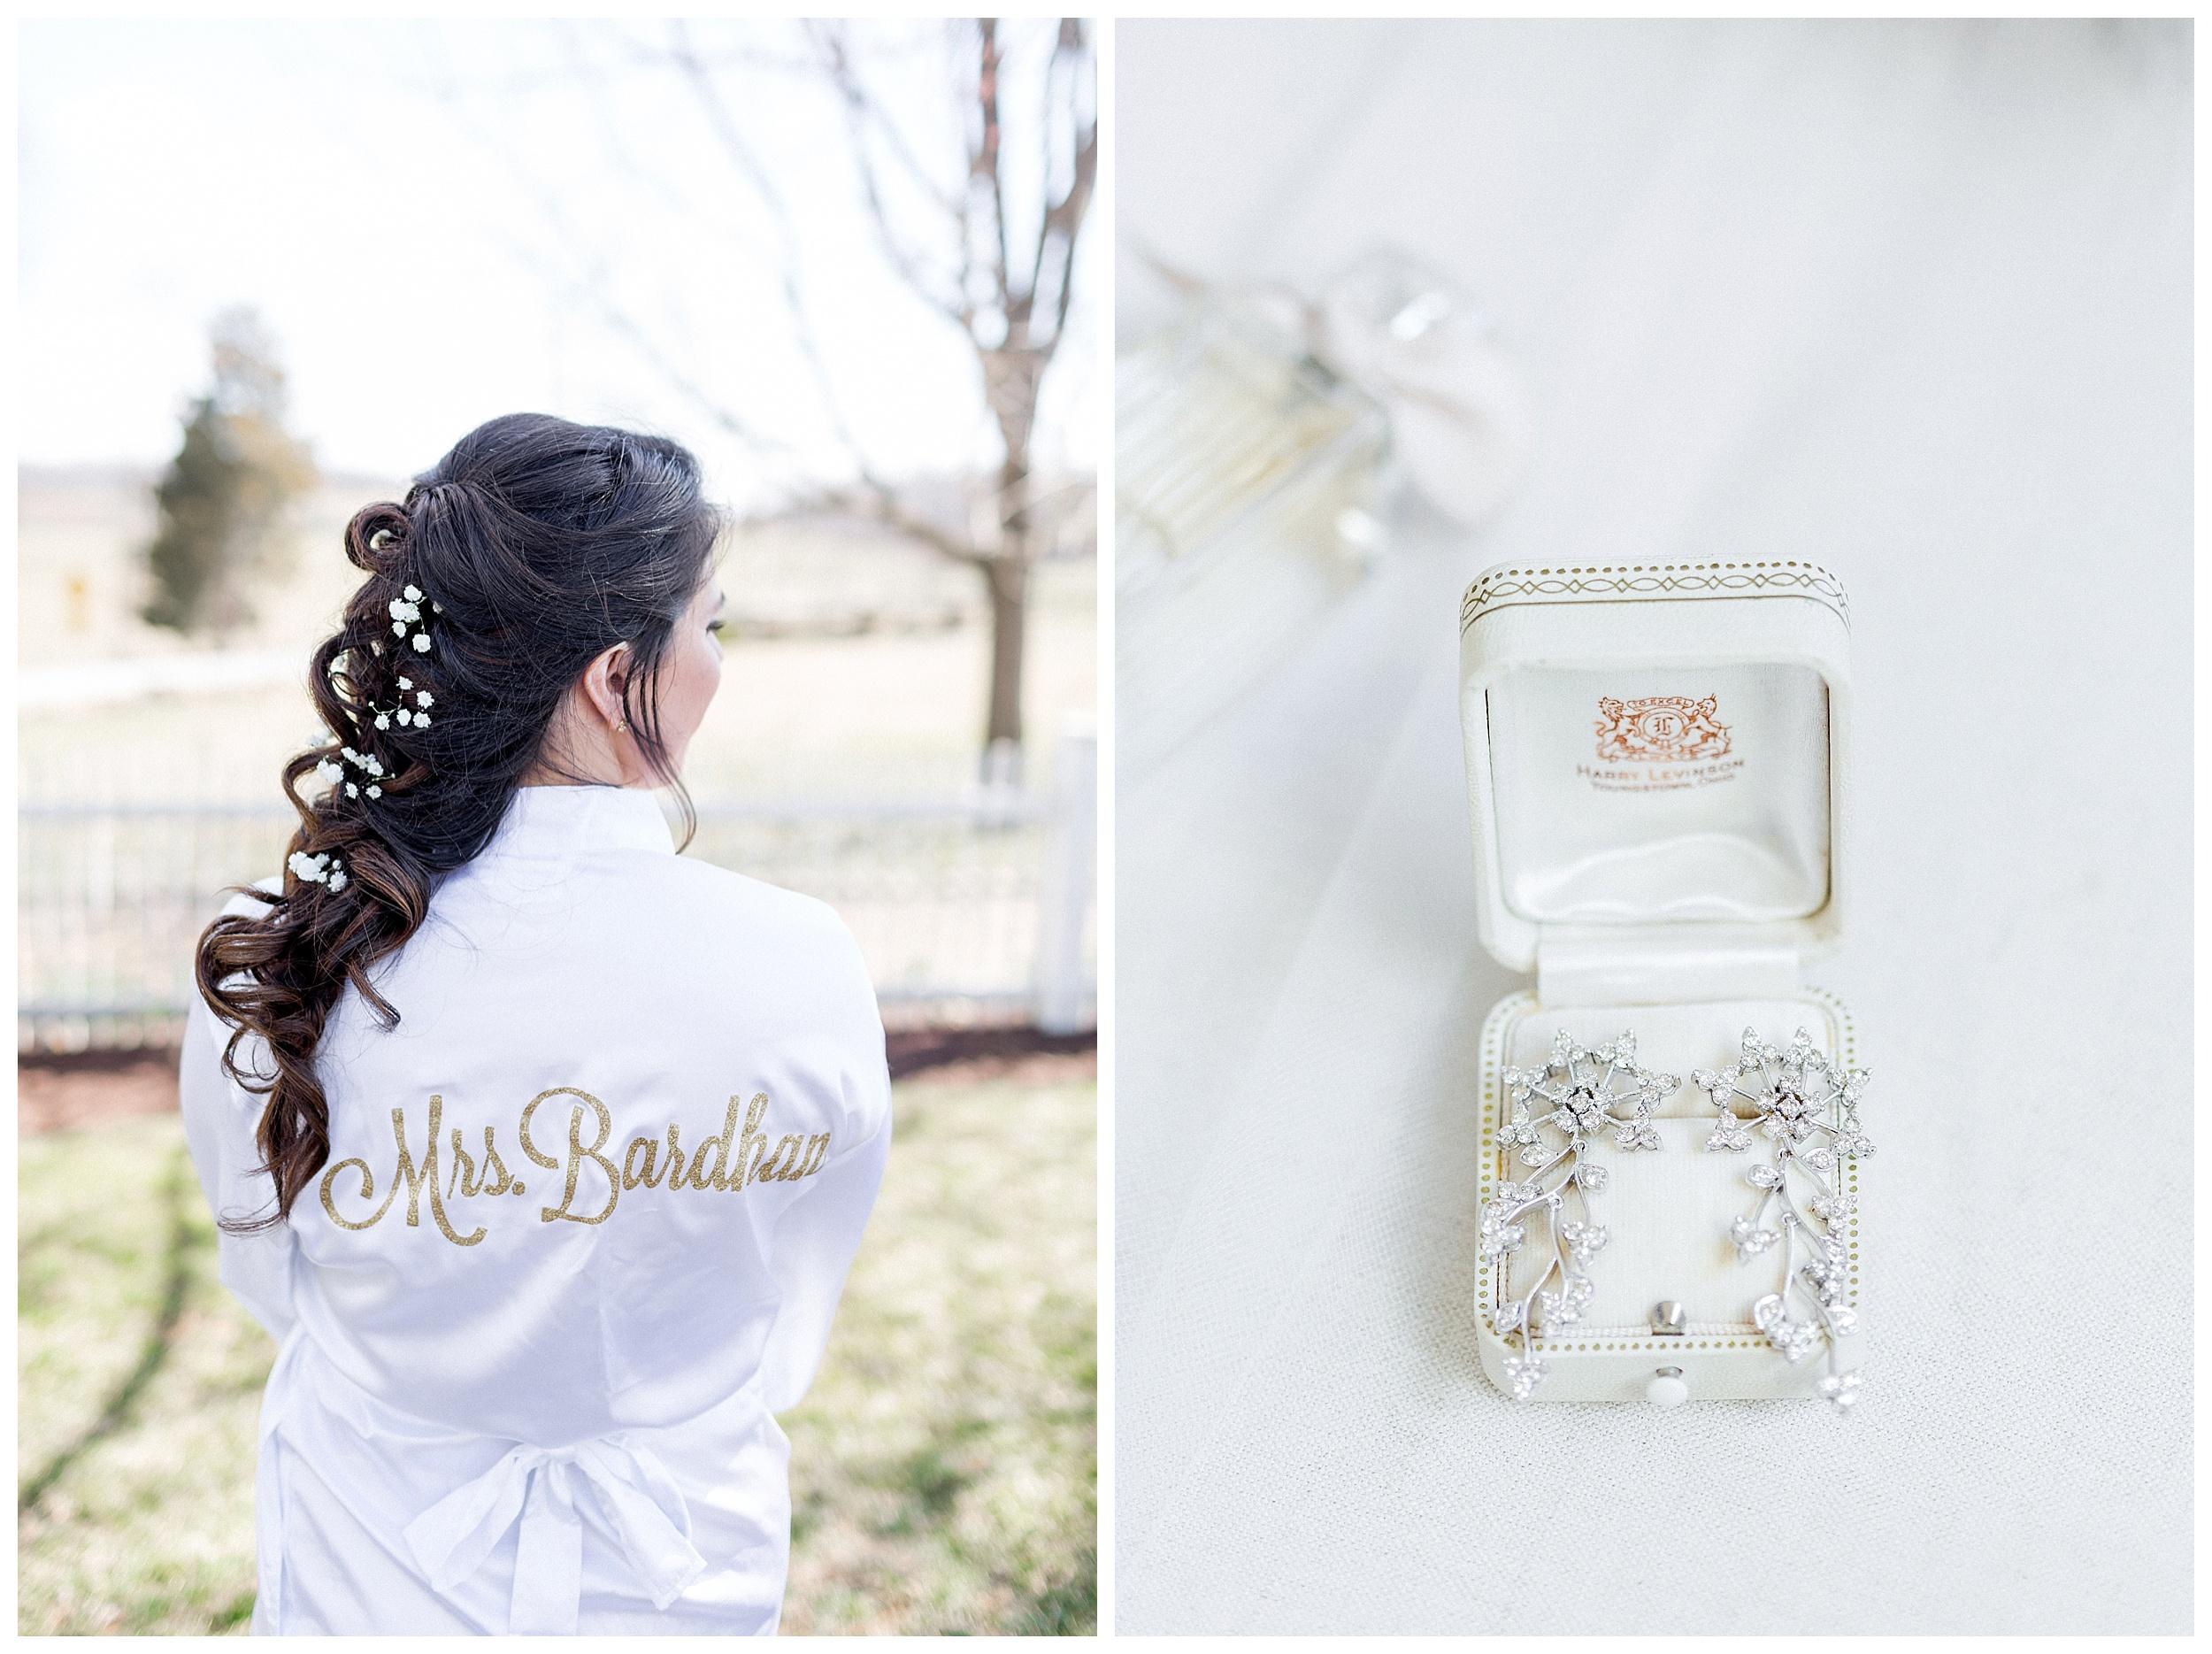 Stone Tower Winery Wedding | Virginia Winter Wedding | VA Wedding Photographer Kir Tuben_0004.jpg